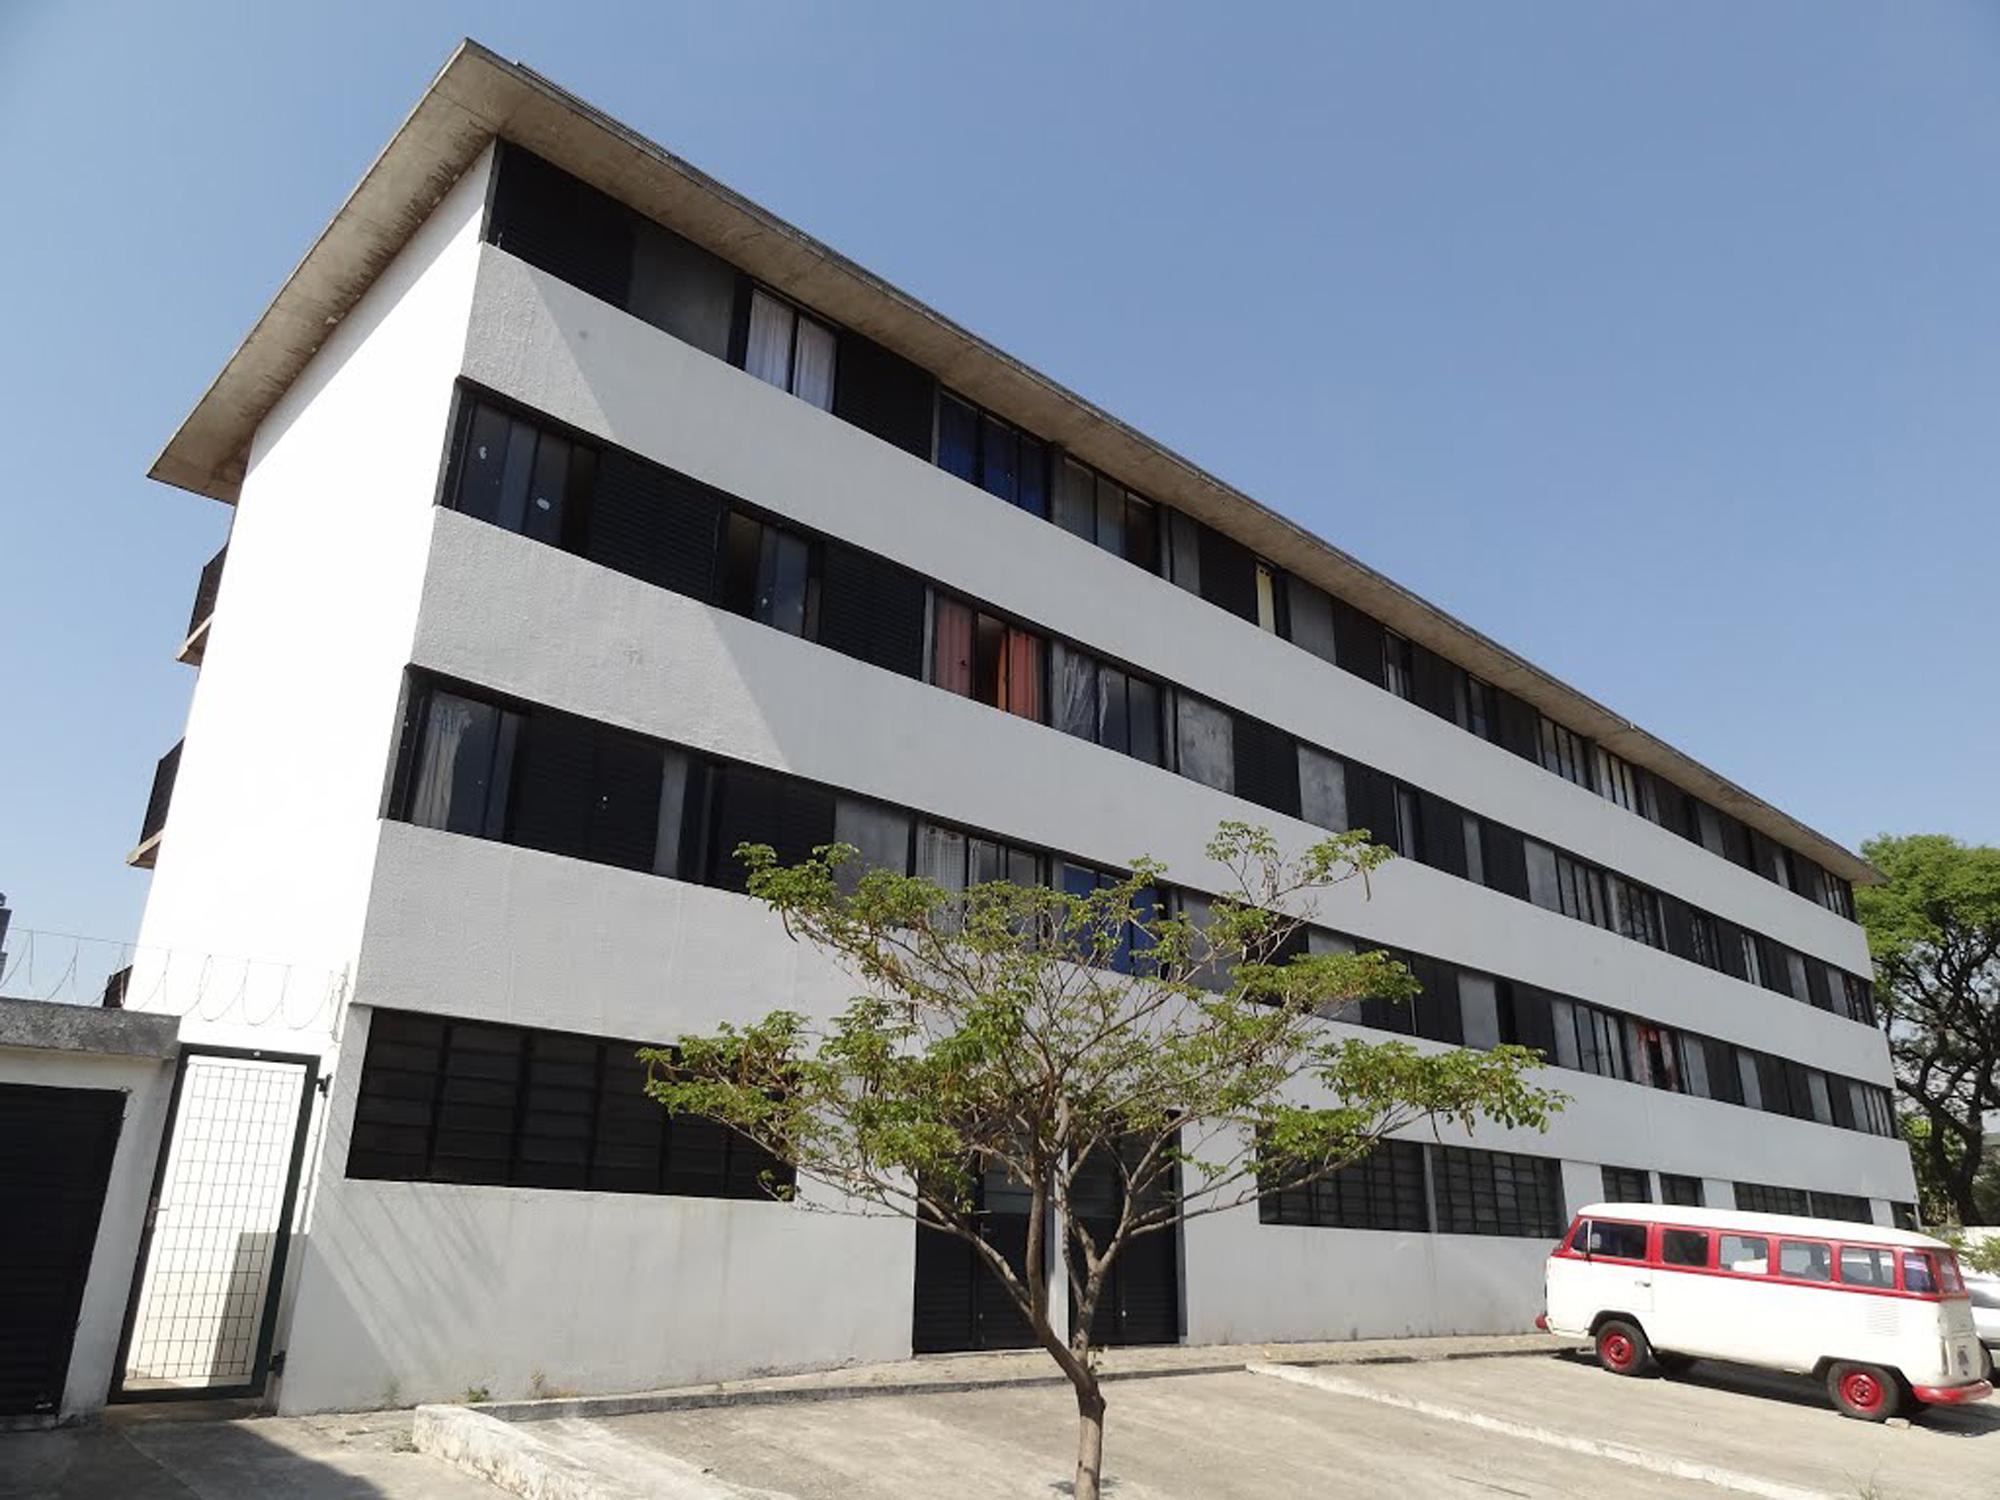 Vila dos Idosos social rent complex in São Paulo